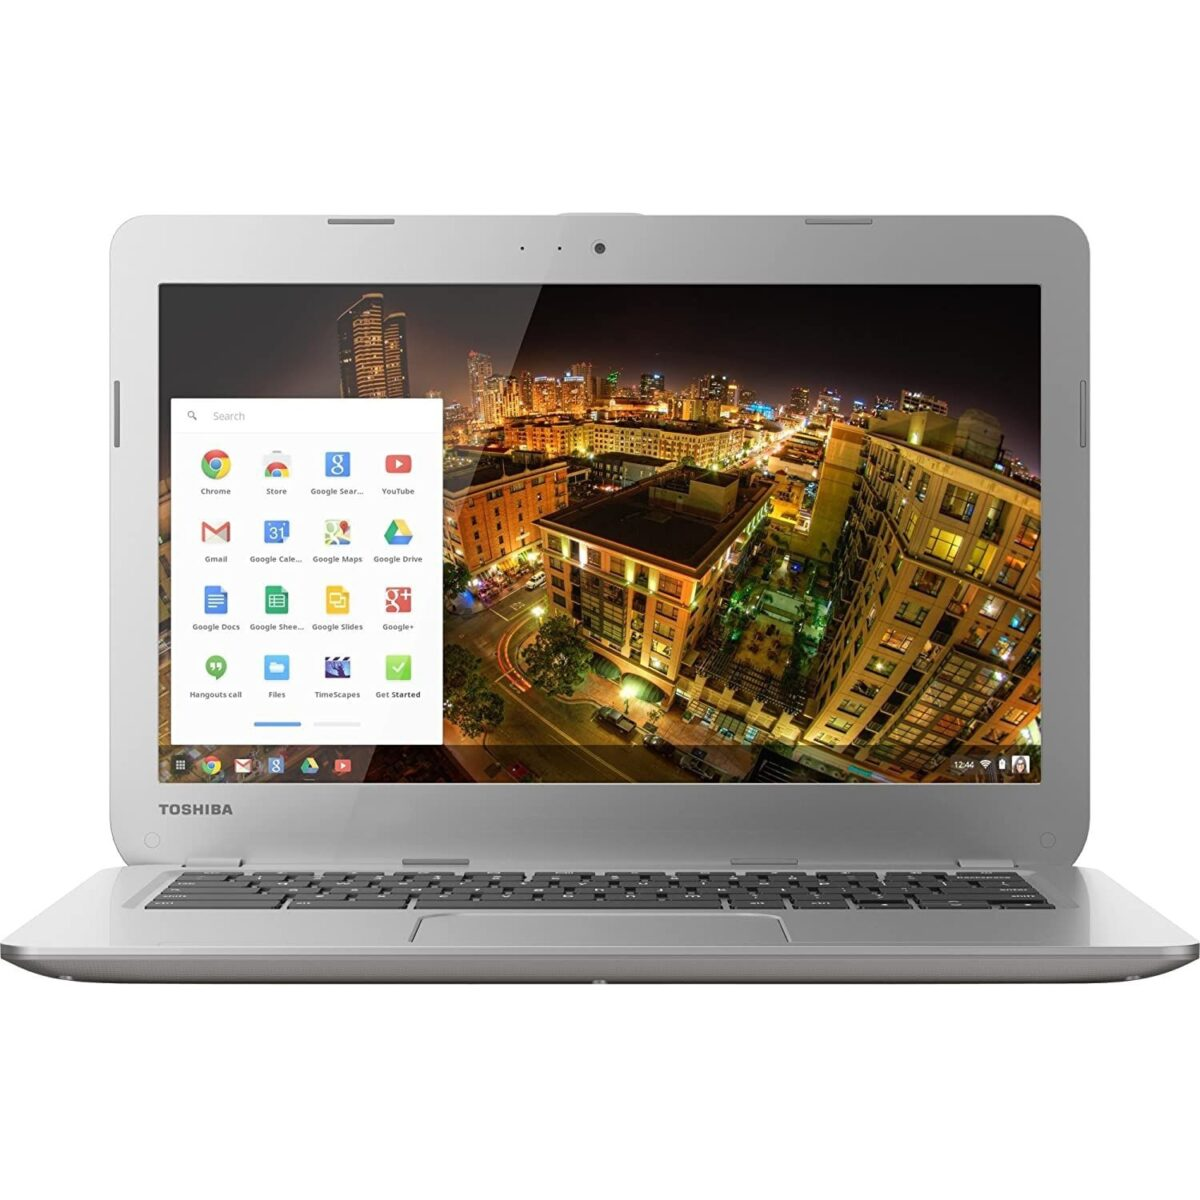 "Toshiba Laptop Chromebook 2 Powerful 13.3"" 16GB 4GB RAM Webcam HDMI Refurbished Intel Sale Chrome OS Silver"